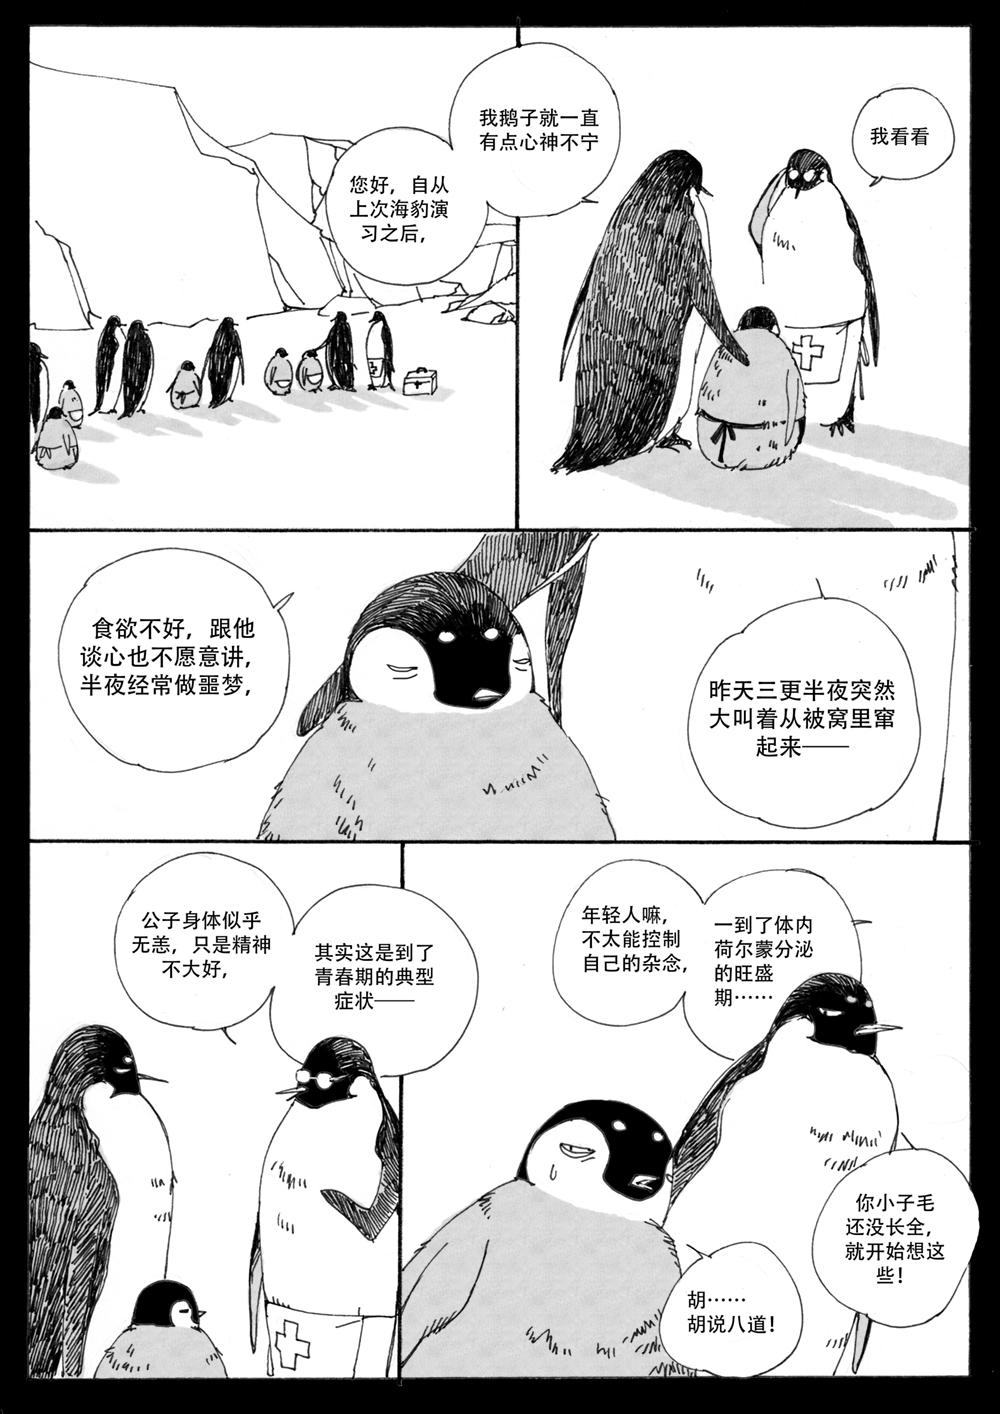 penguin27_1000